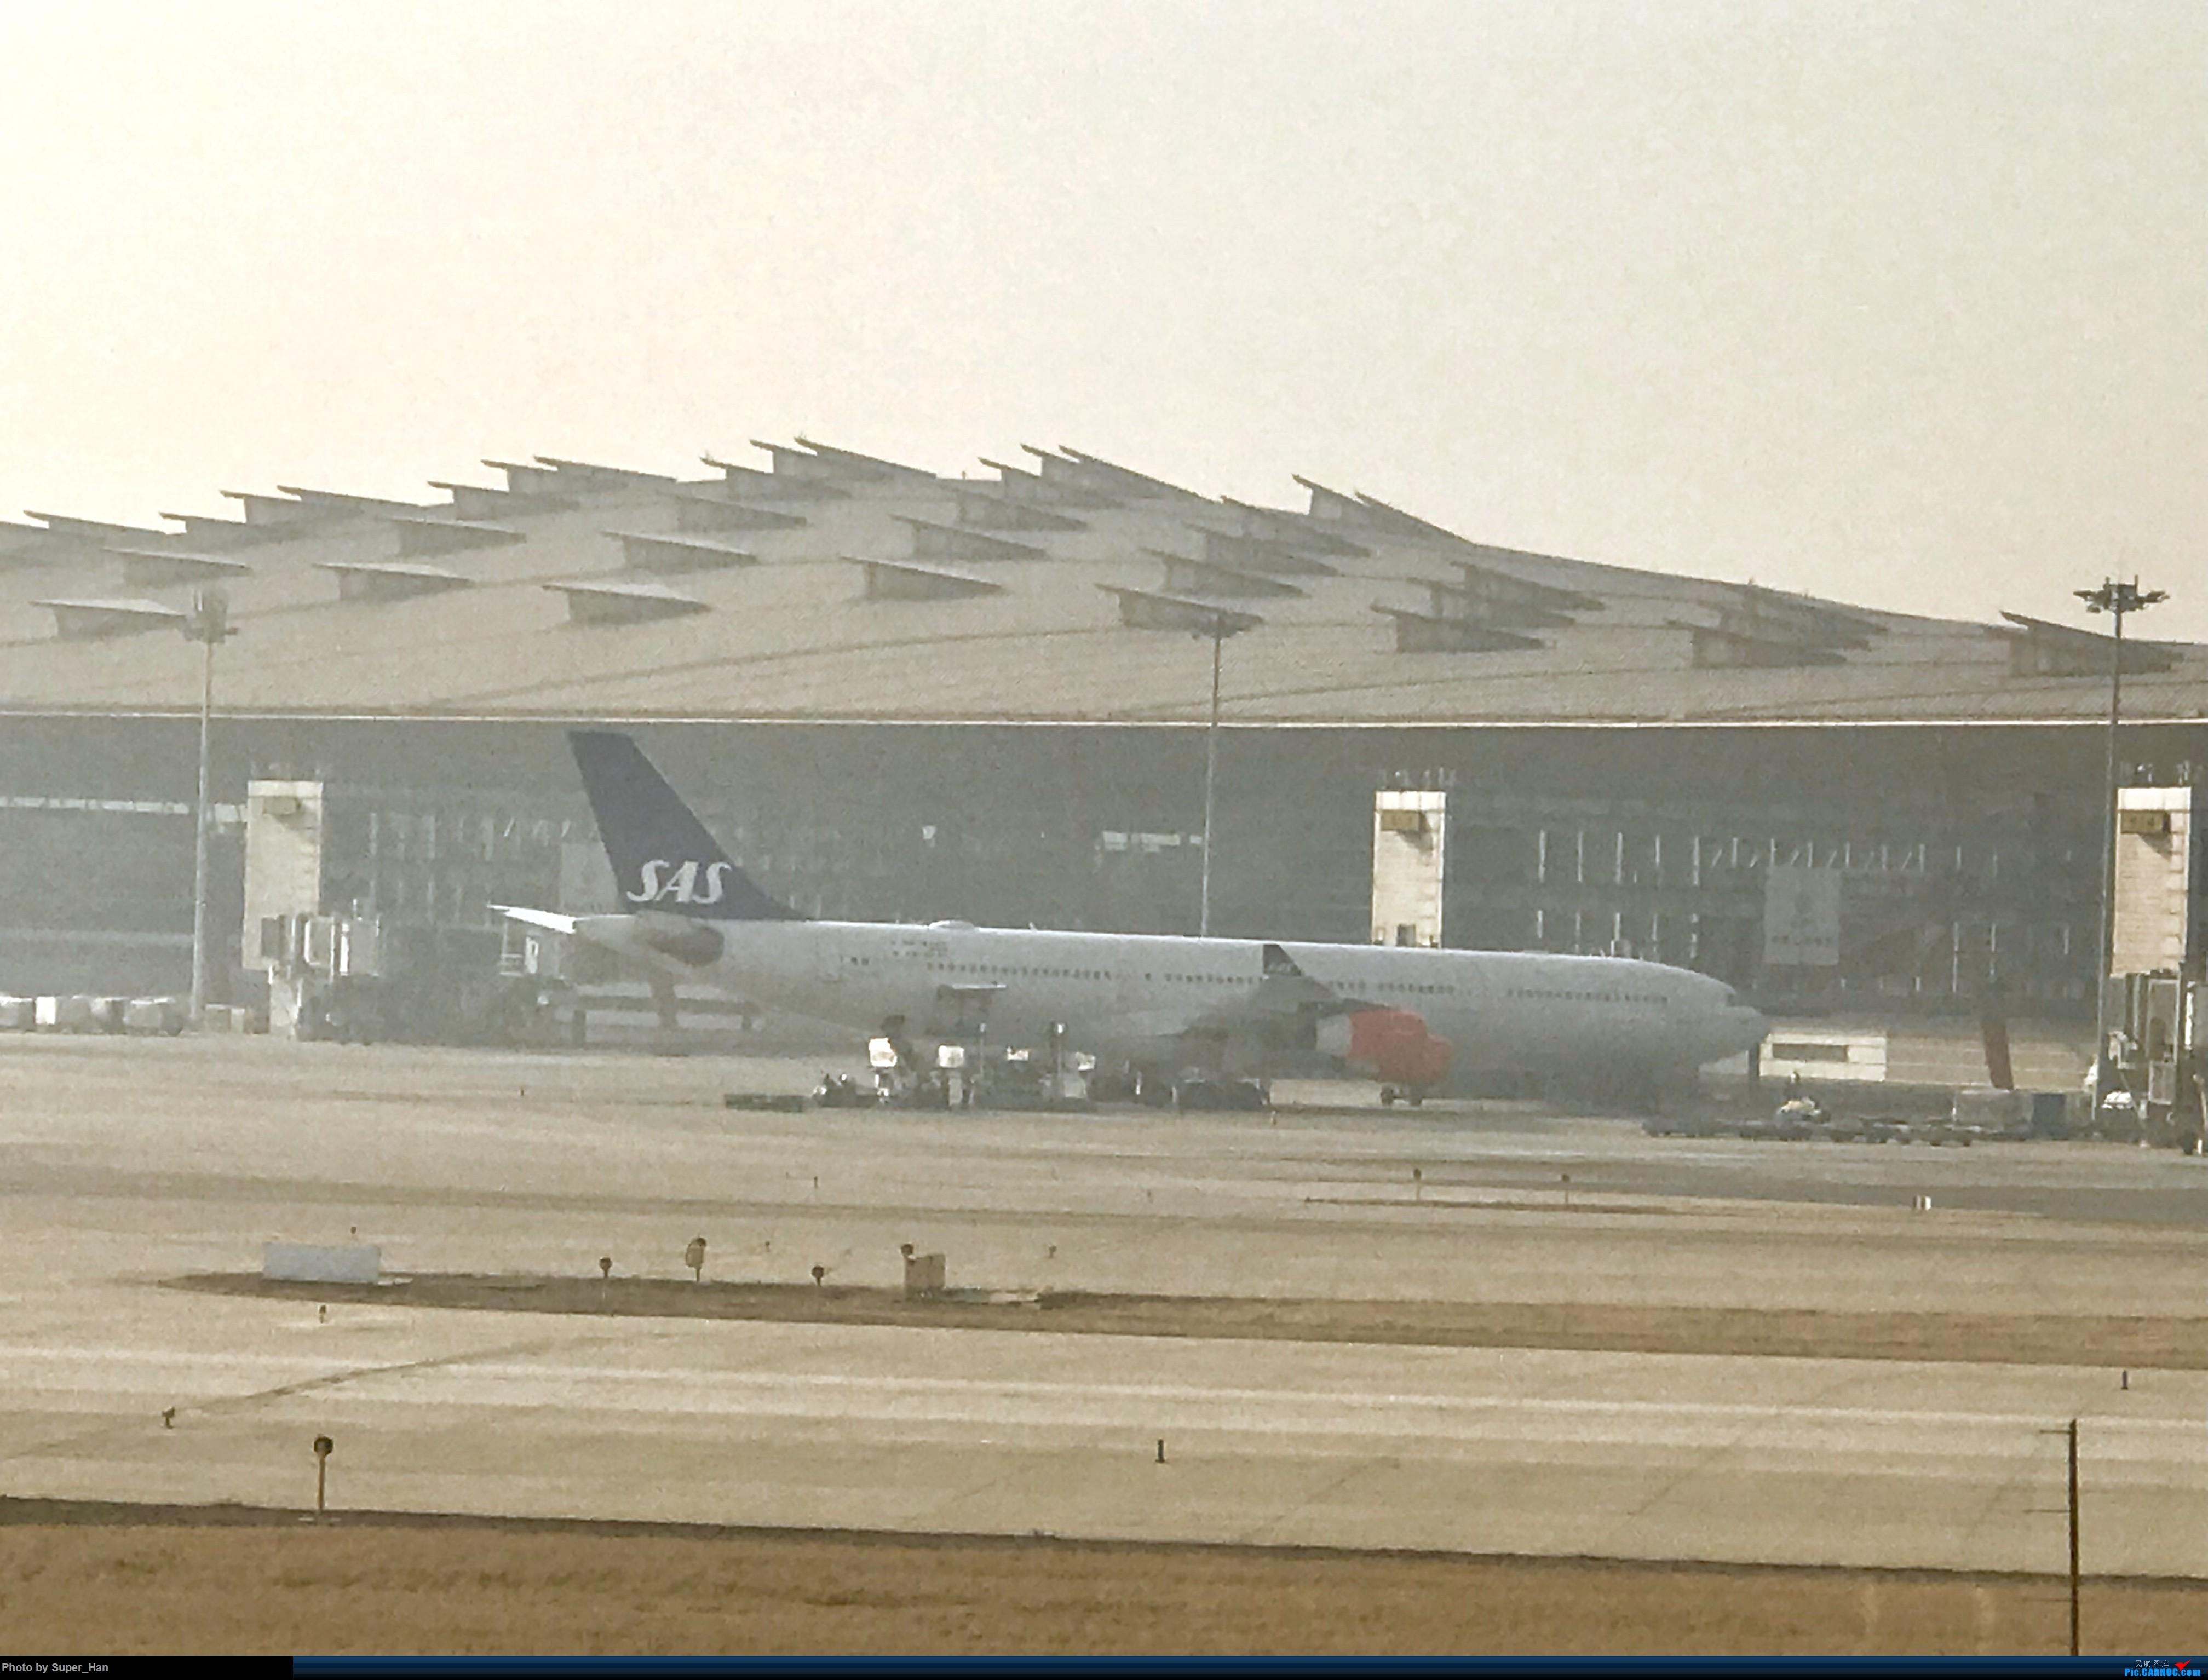 Re:[原创]2019虹桥出发飞北京第一拍 AIRBUS A340-313X OYKBD 中国北京首都国际机场